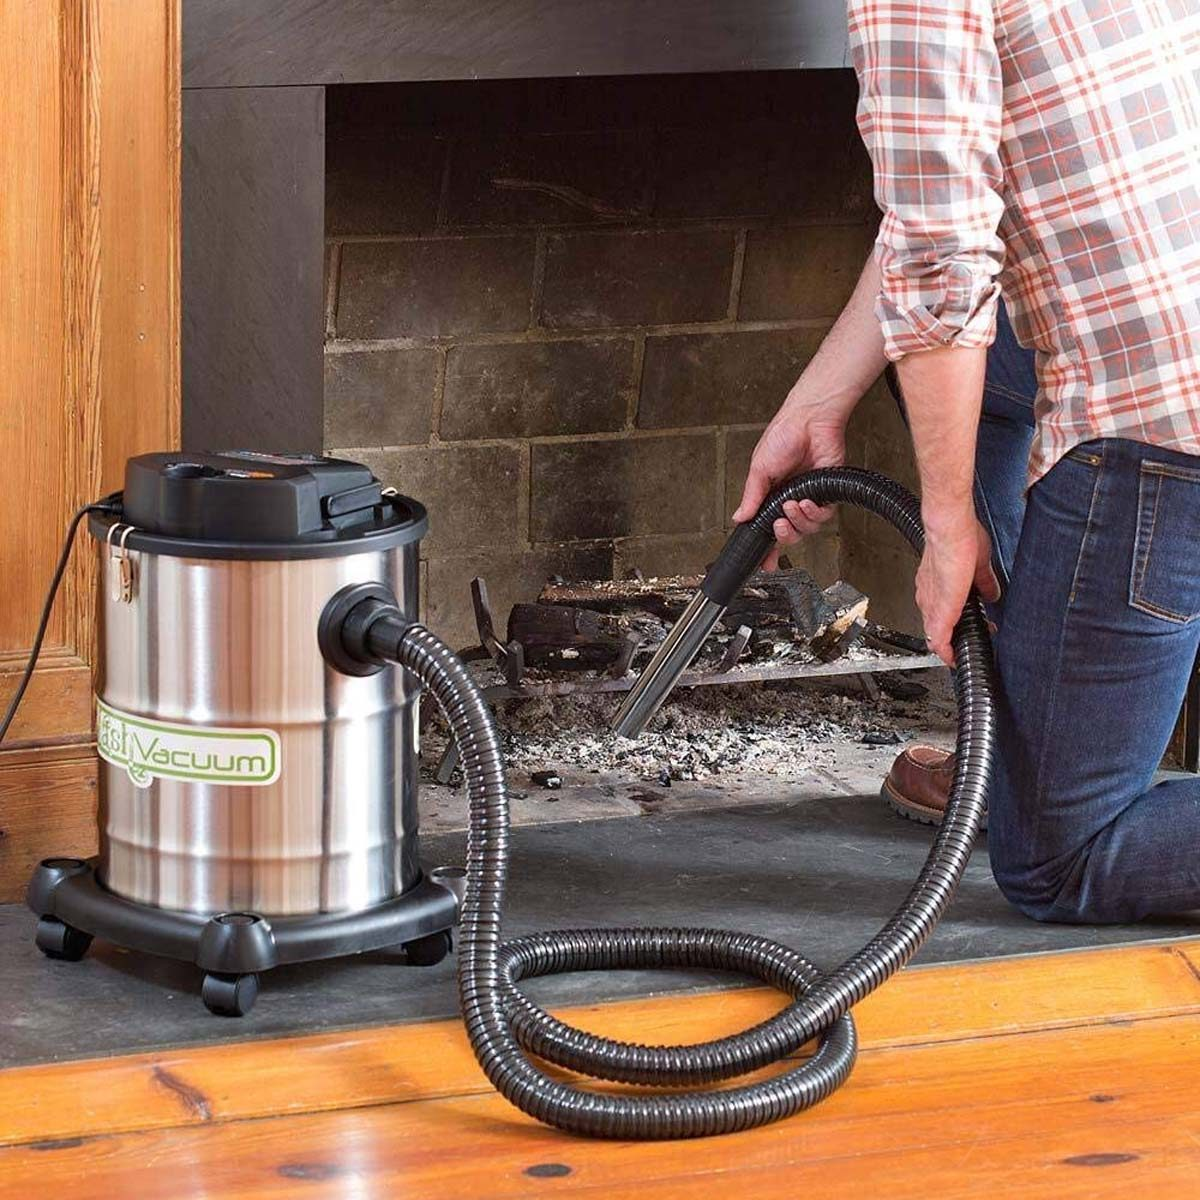 Fireplace vacuum